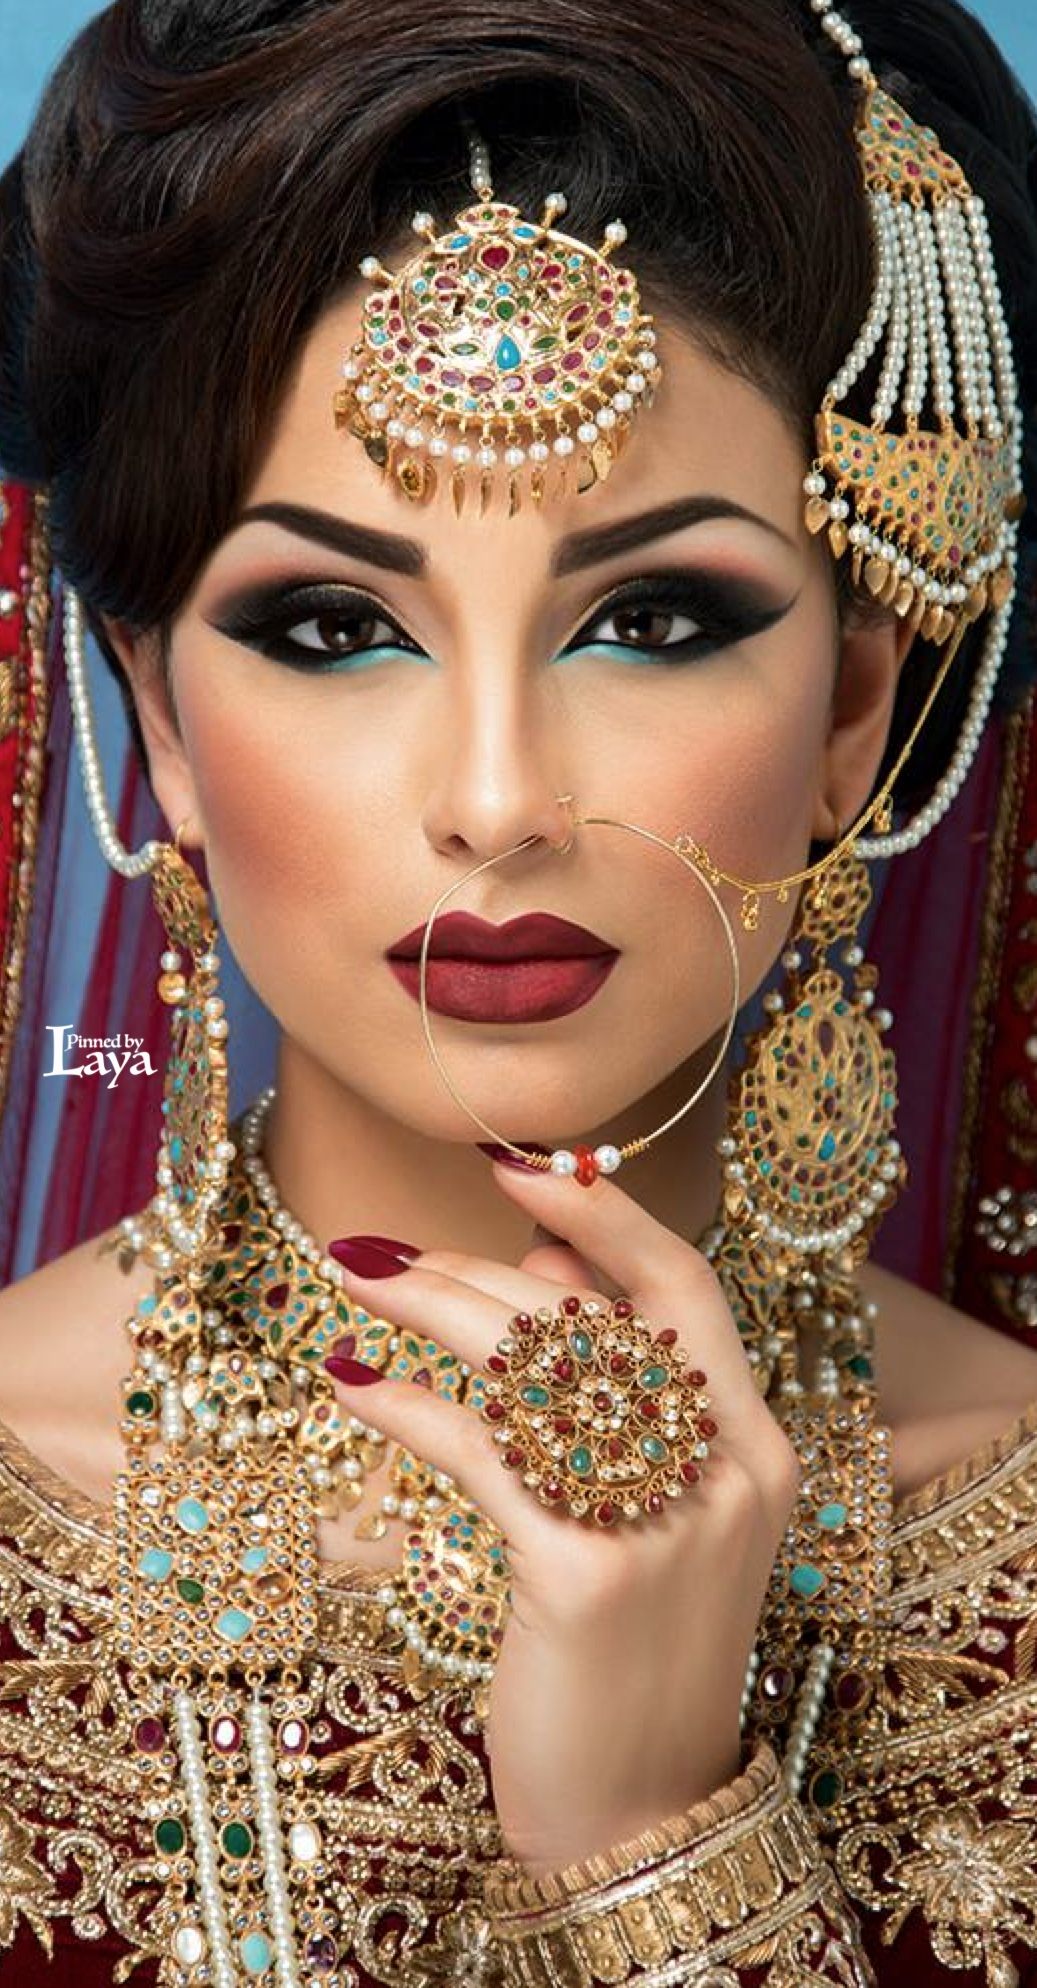 Pin By Parm Mann On Bridal | Asian Bridal Makeup, Indian Wedding regarding New Indian Bridal Makeup Pics